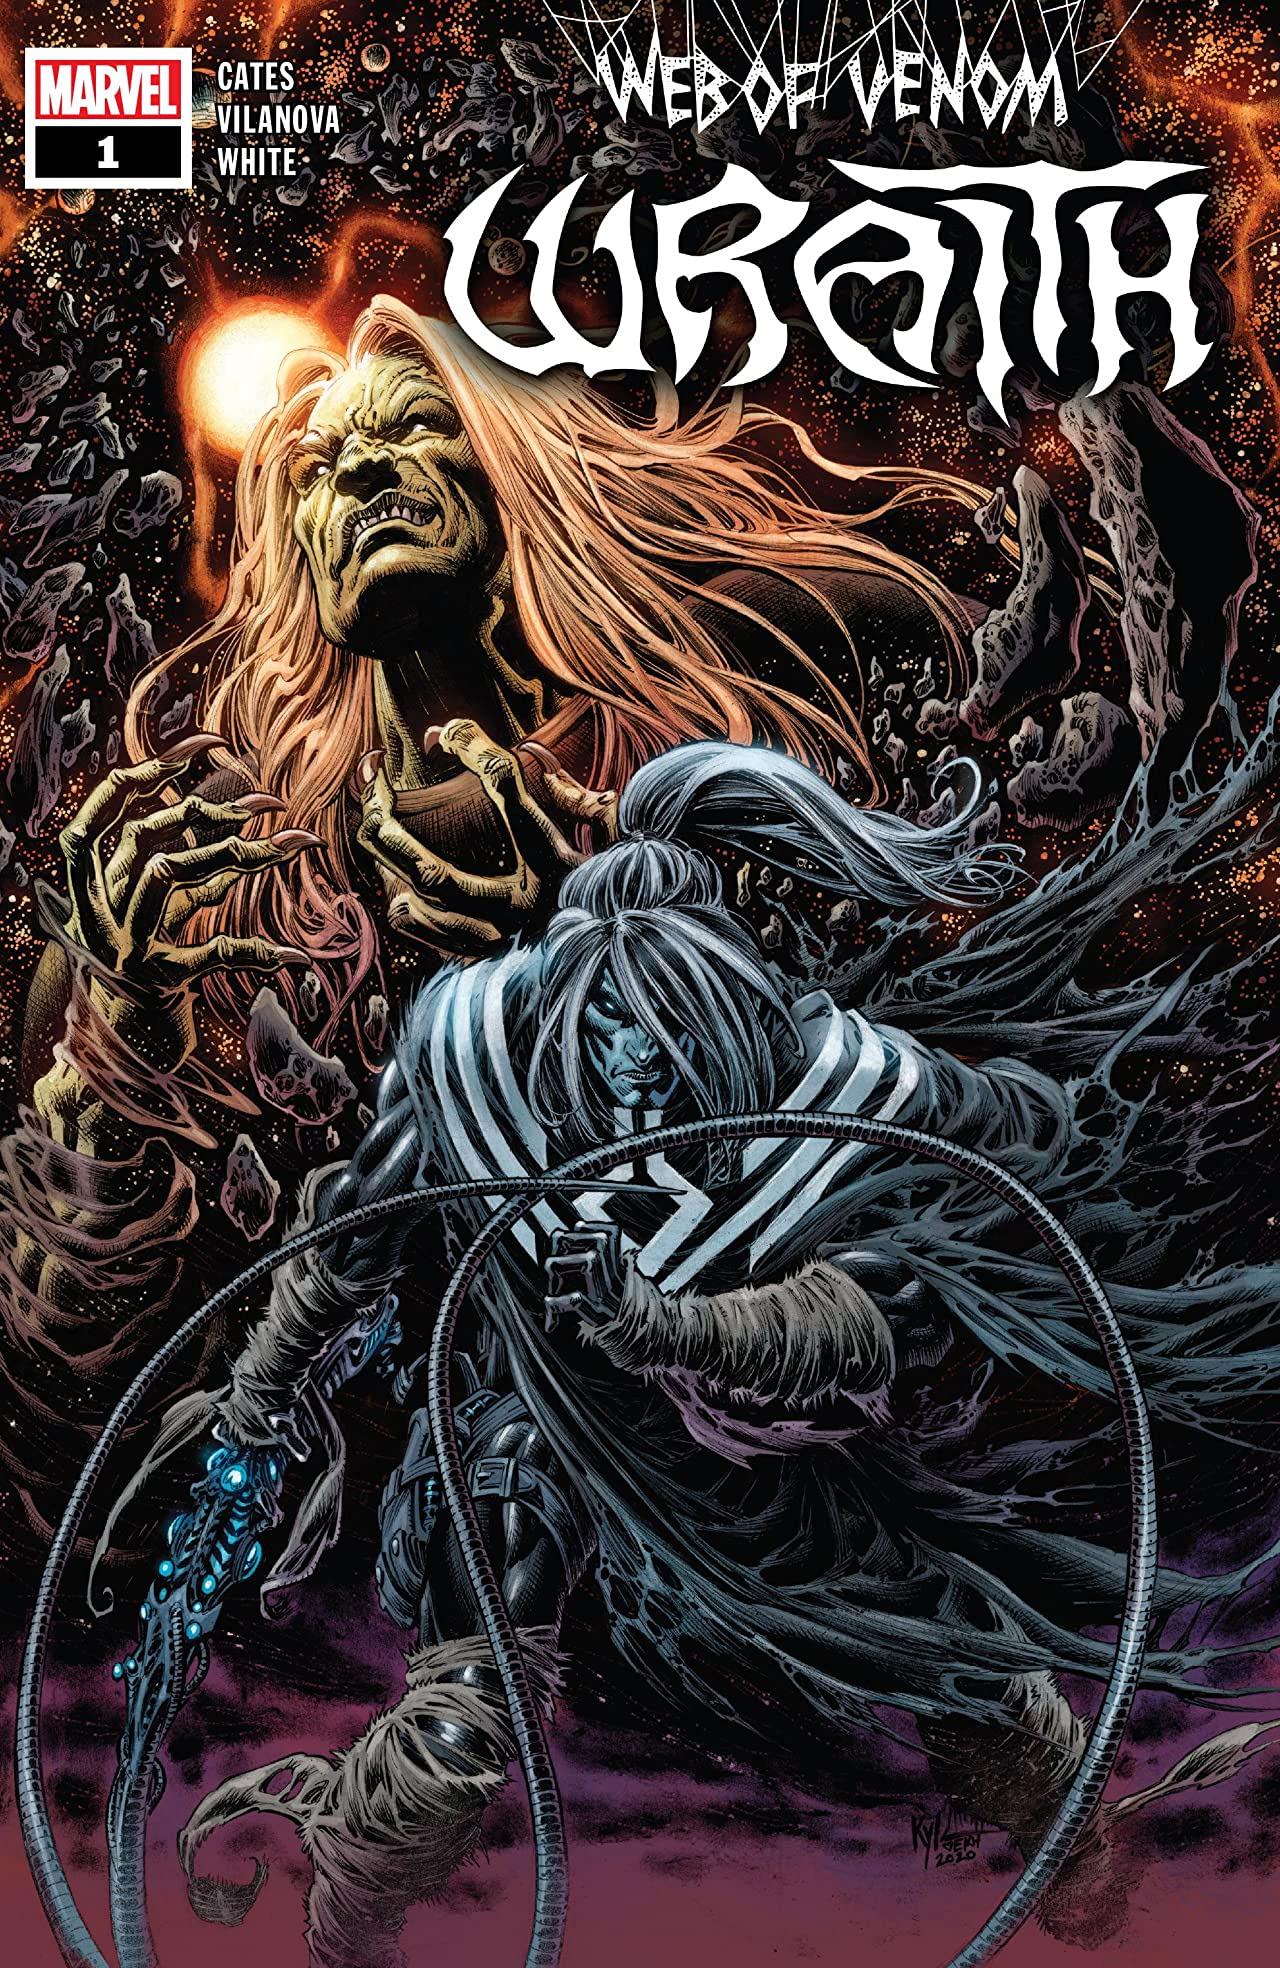 Web of Venom: Wraith Vol 1